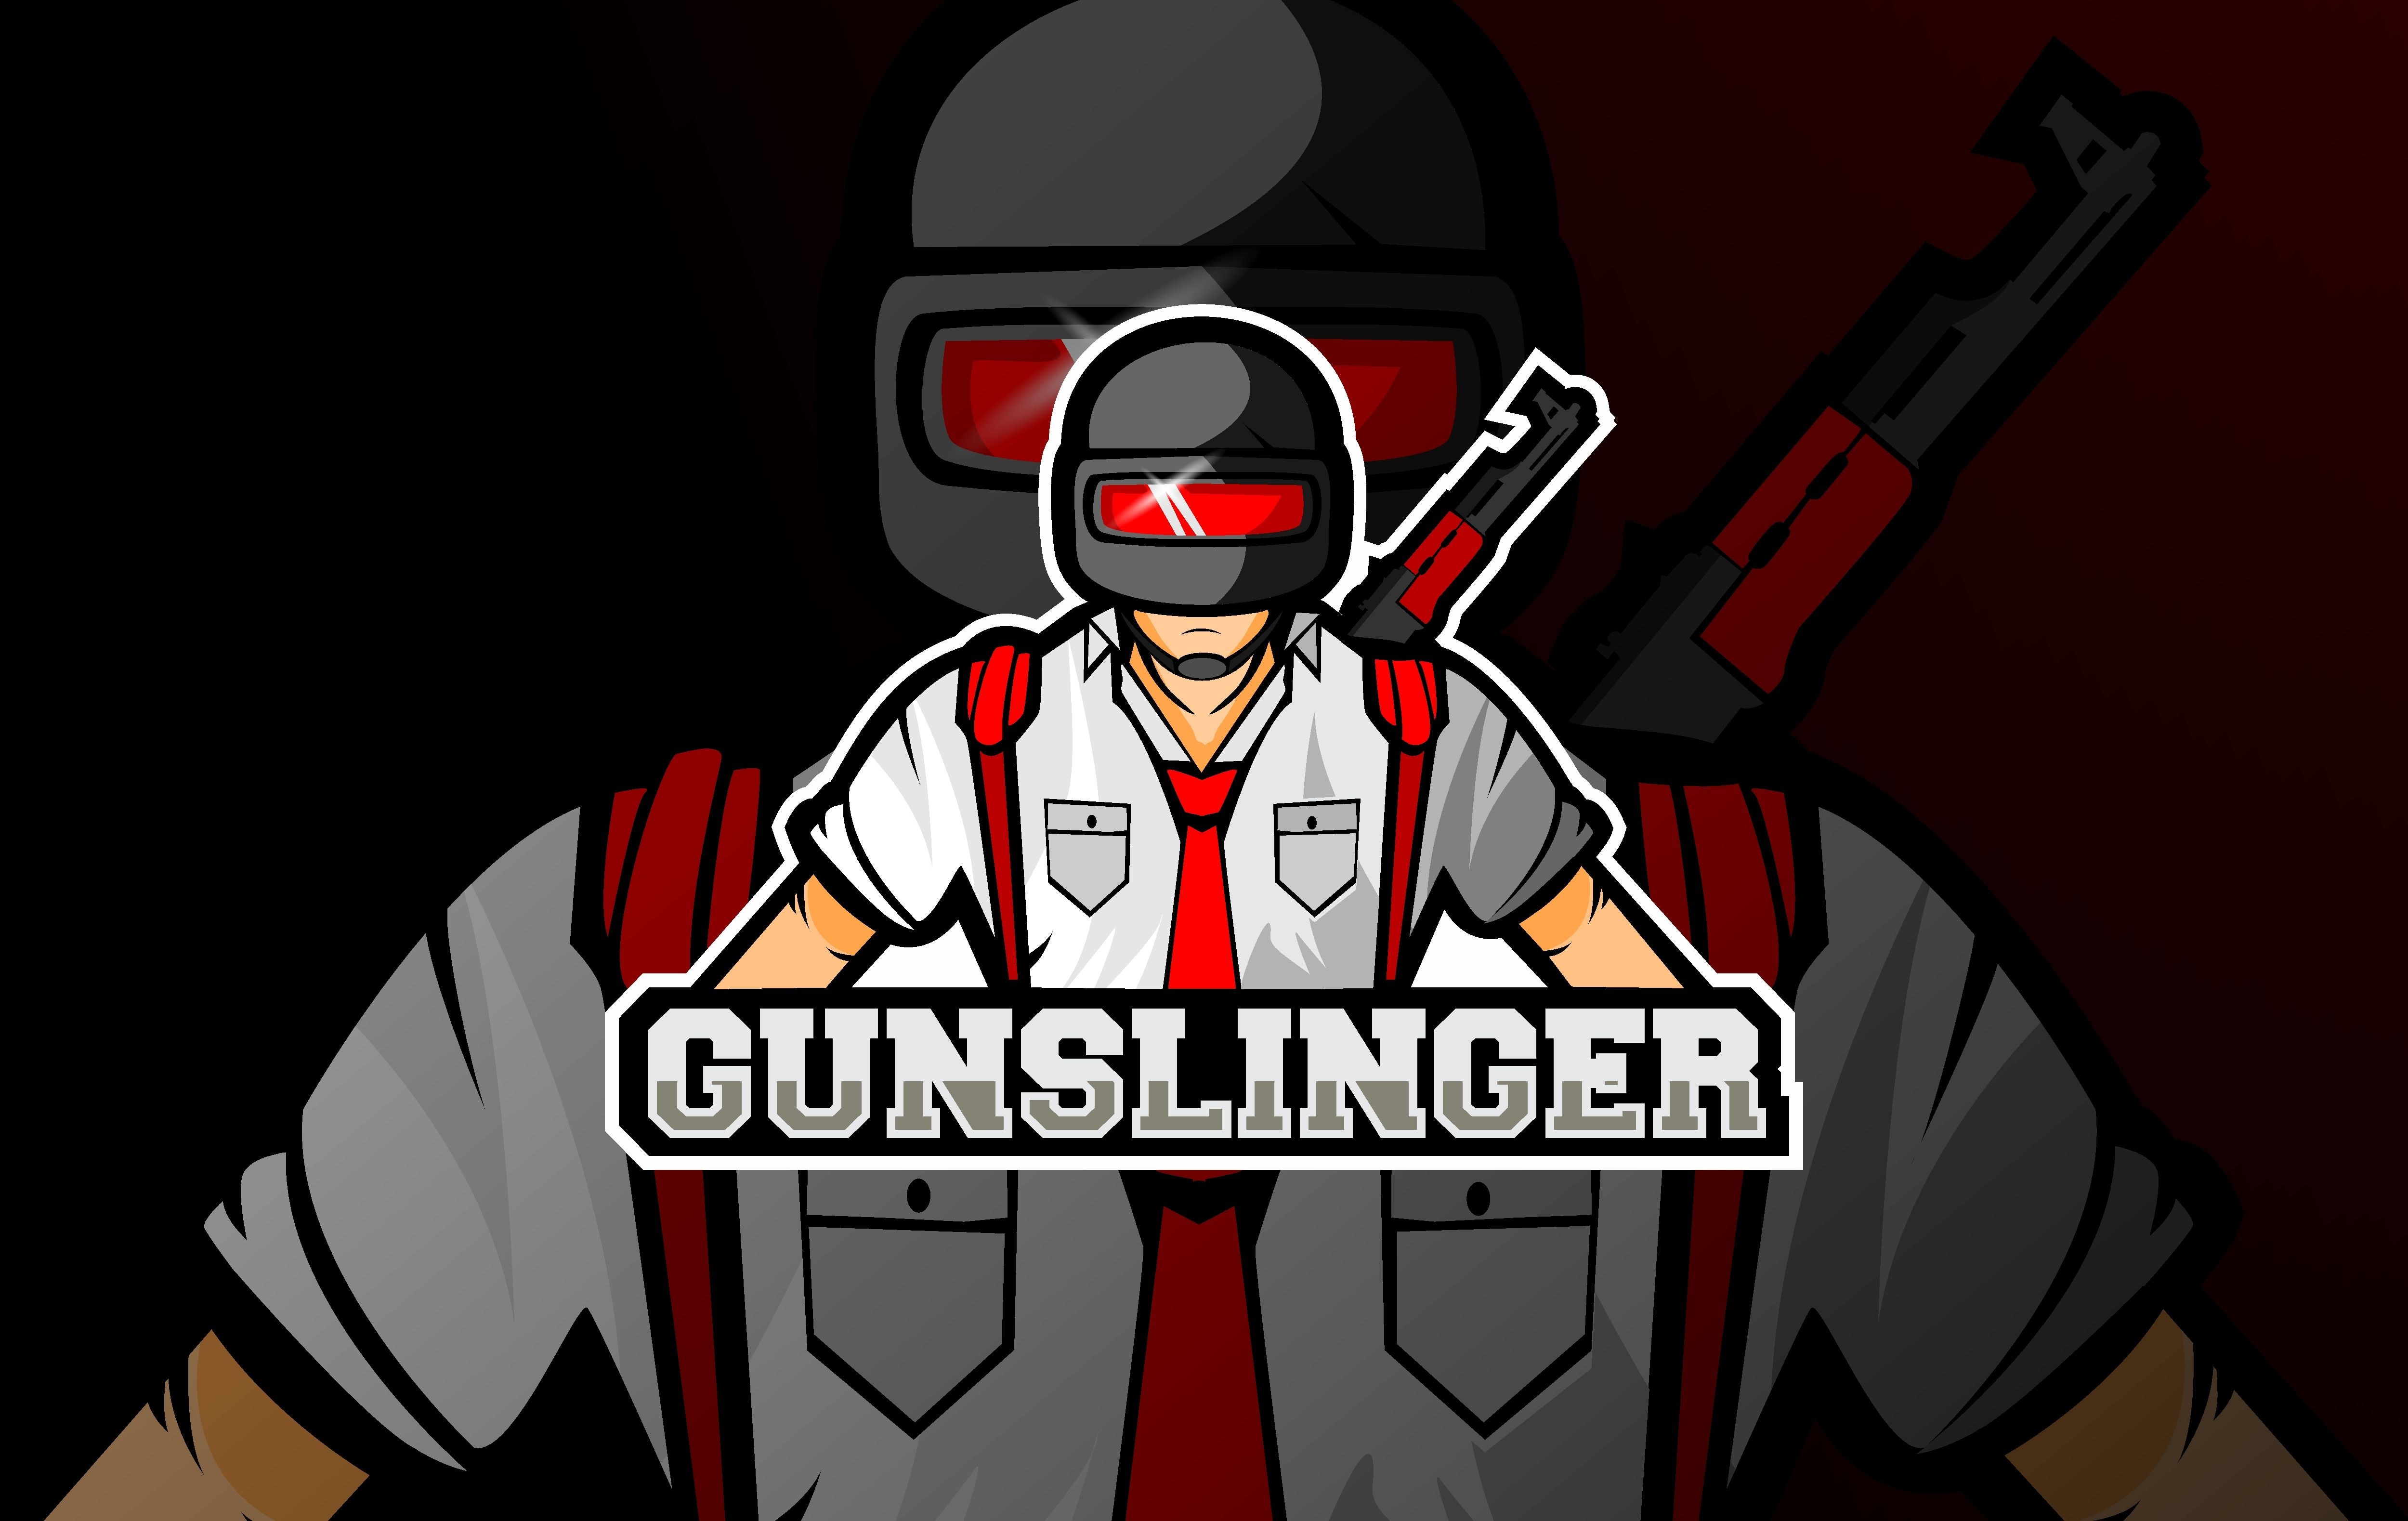 Pubg Illustration 4k Hd Games 4k Wallpapers Images: Gunslinger Pubg 4k, HD Games, 4k Wallpapers, Images